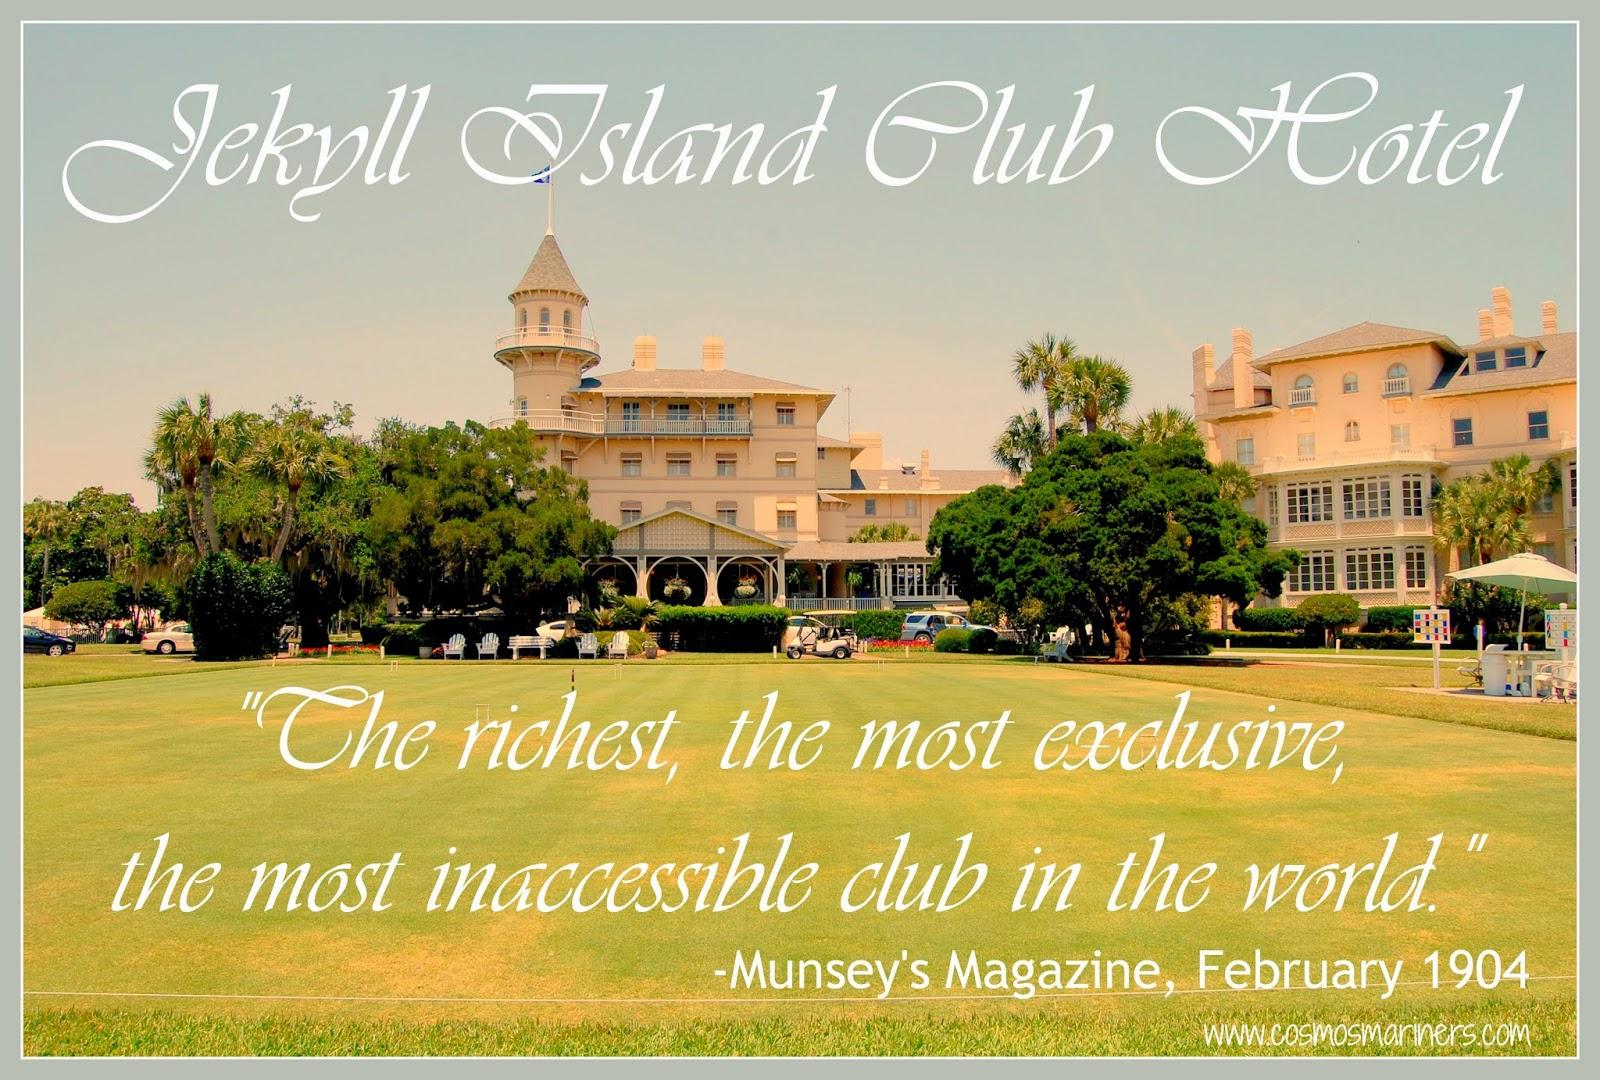 Jekyll Island Hotel Club, Jekyll Island, Georgia